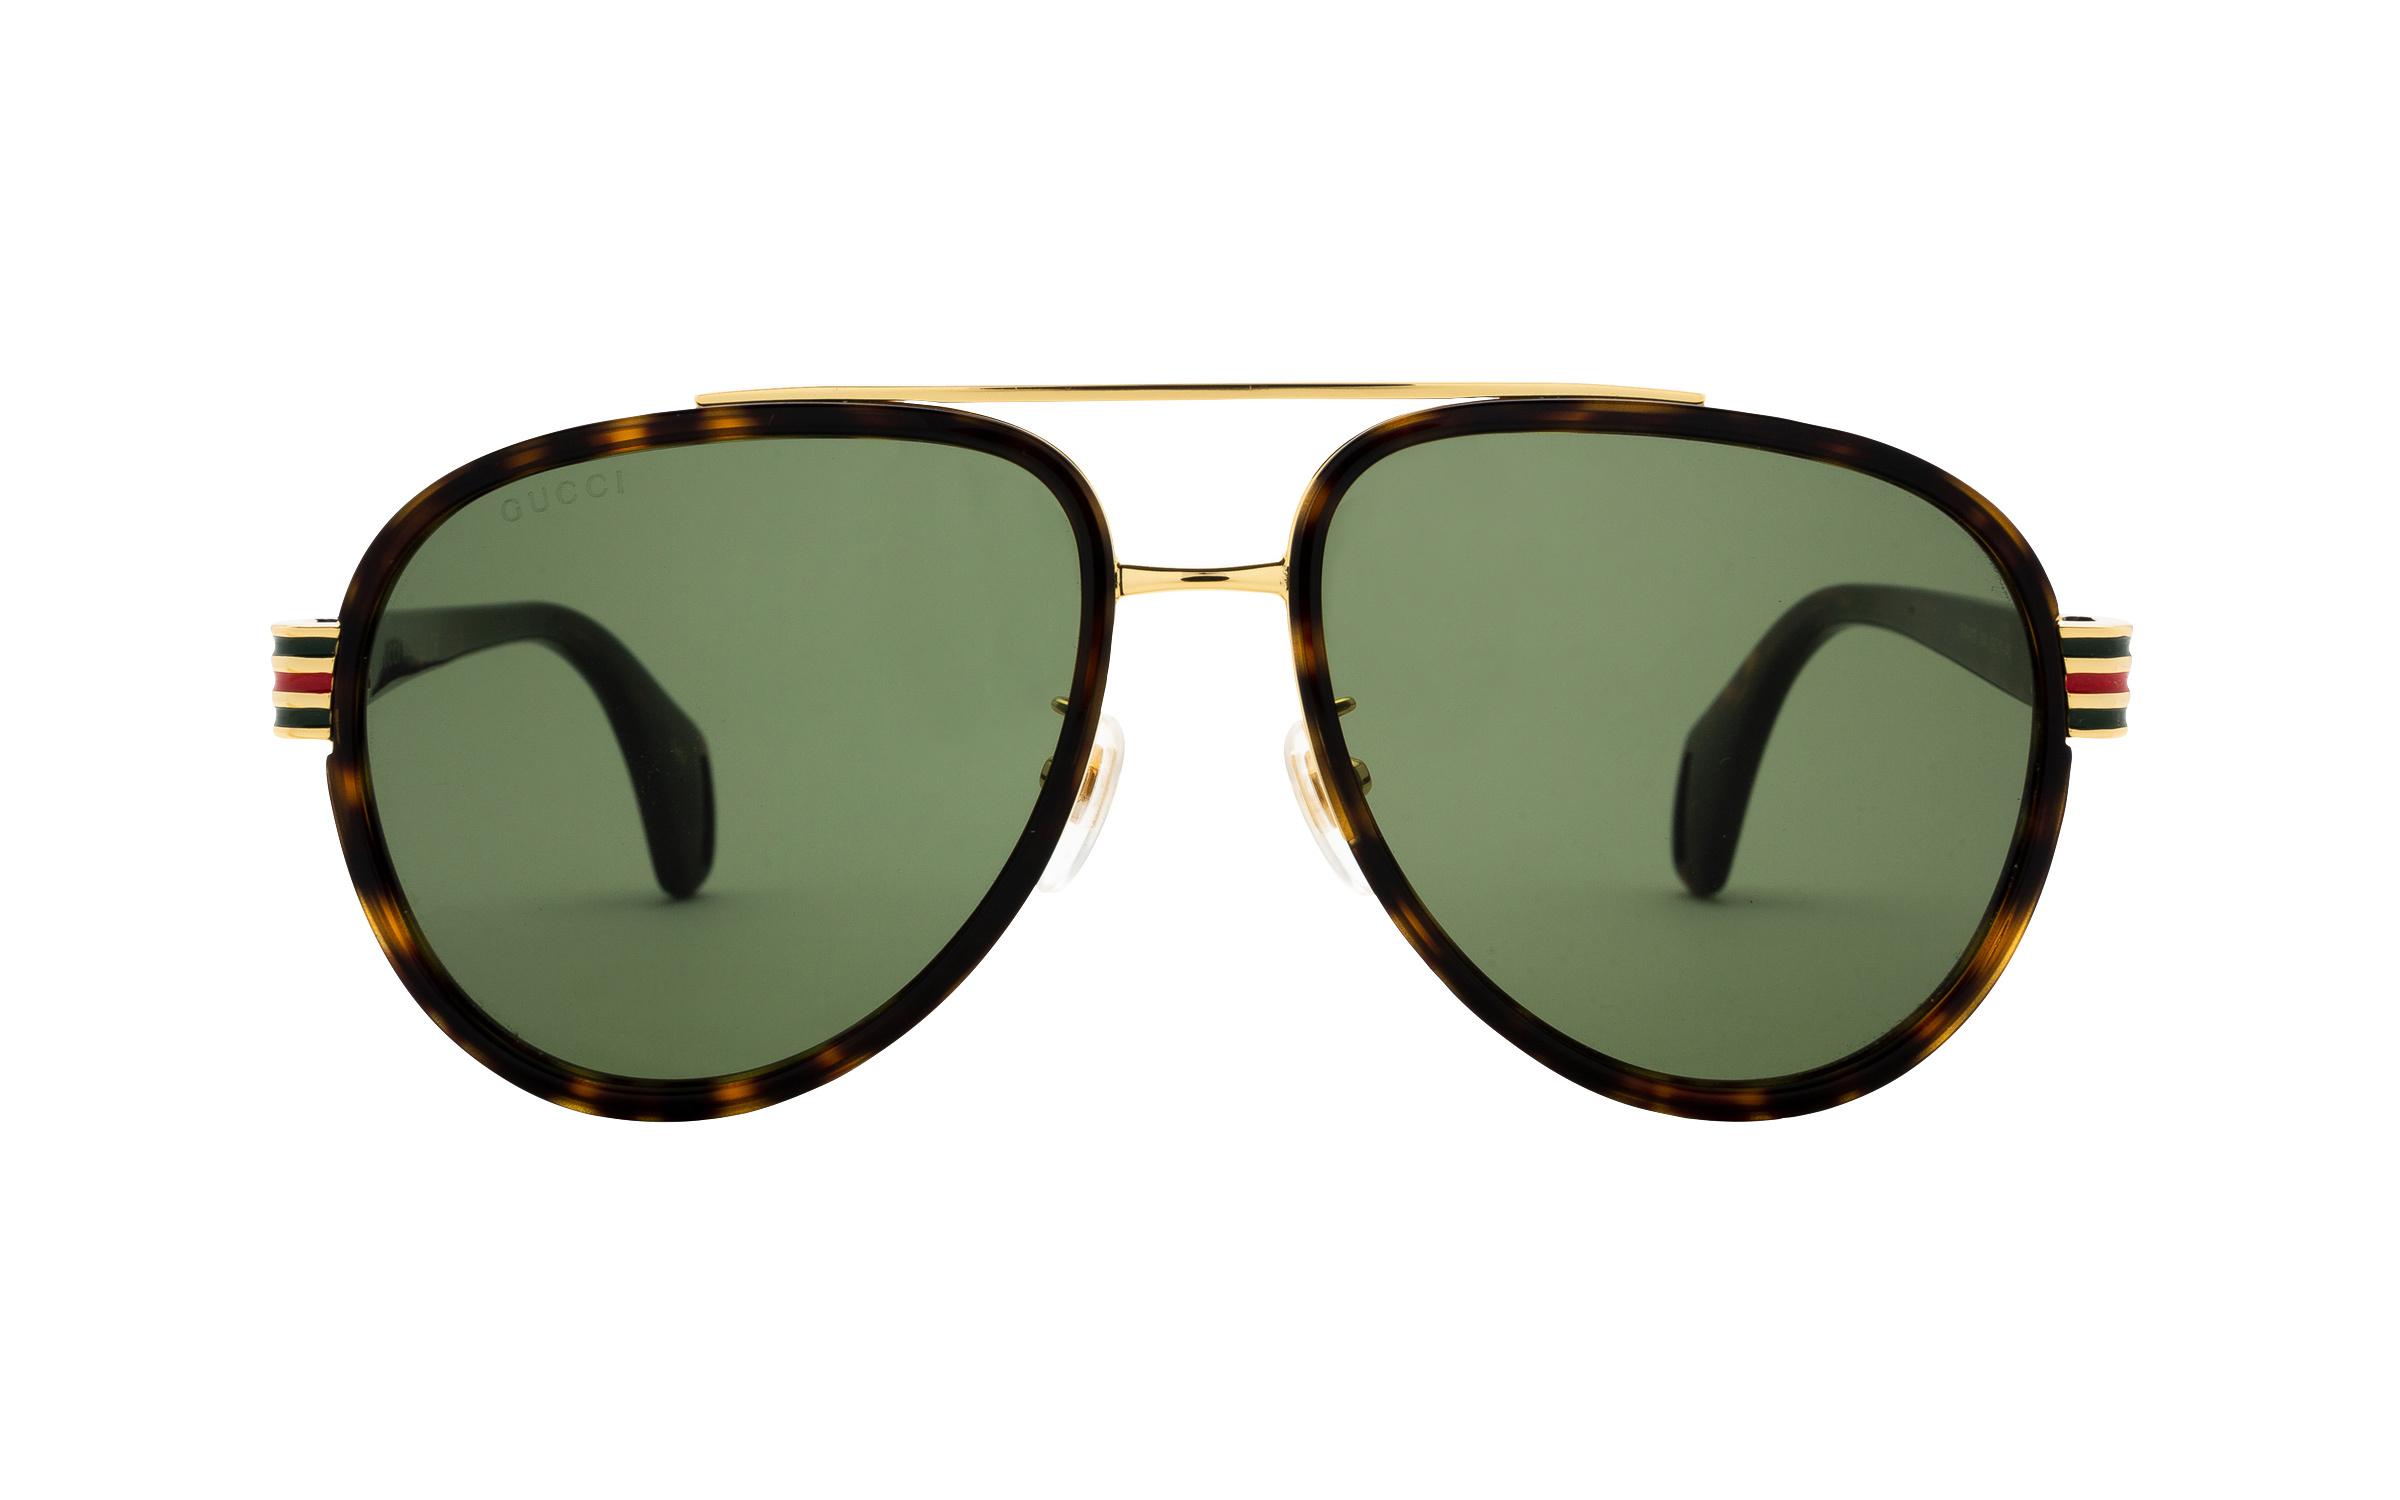 http://www.coastal.com/ - Gucci GG0447S 004 58 Sunglasses in Havana Tortoise – Online Coastal